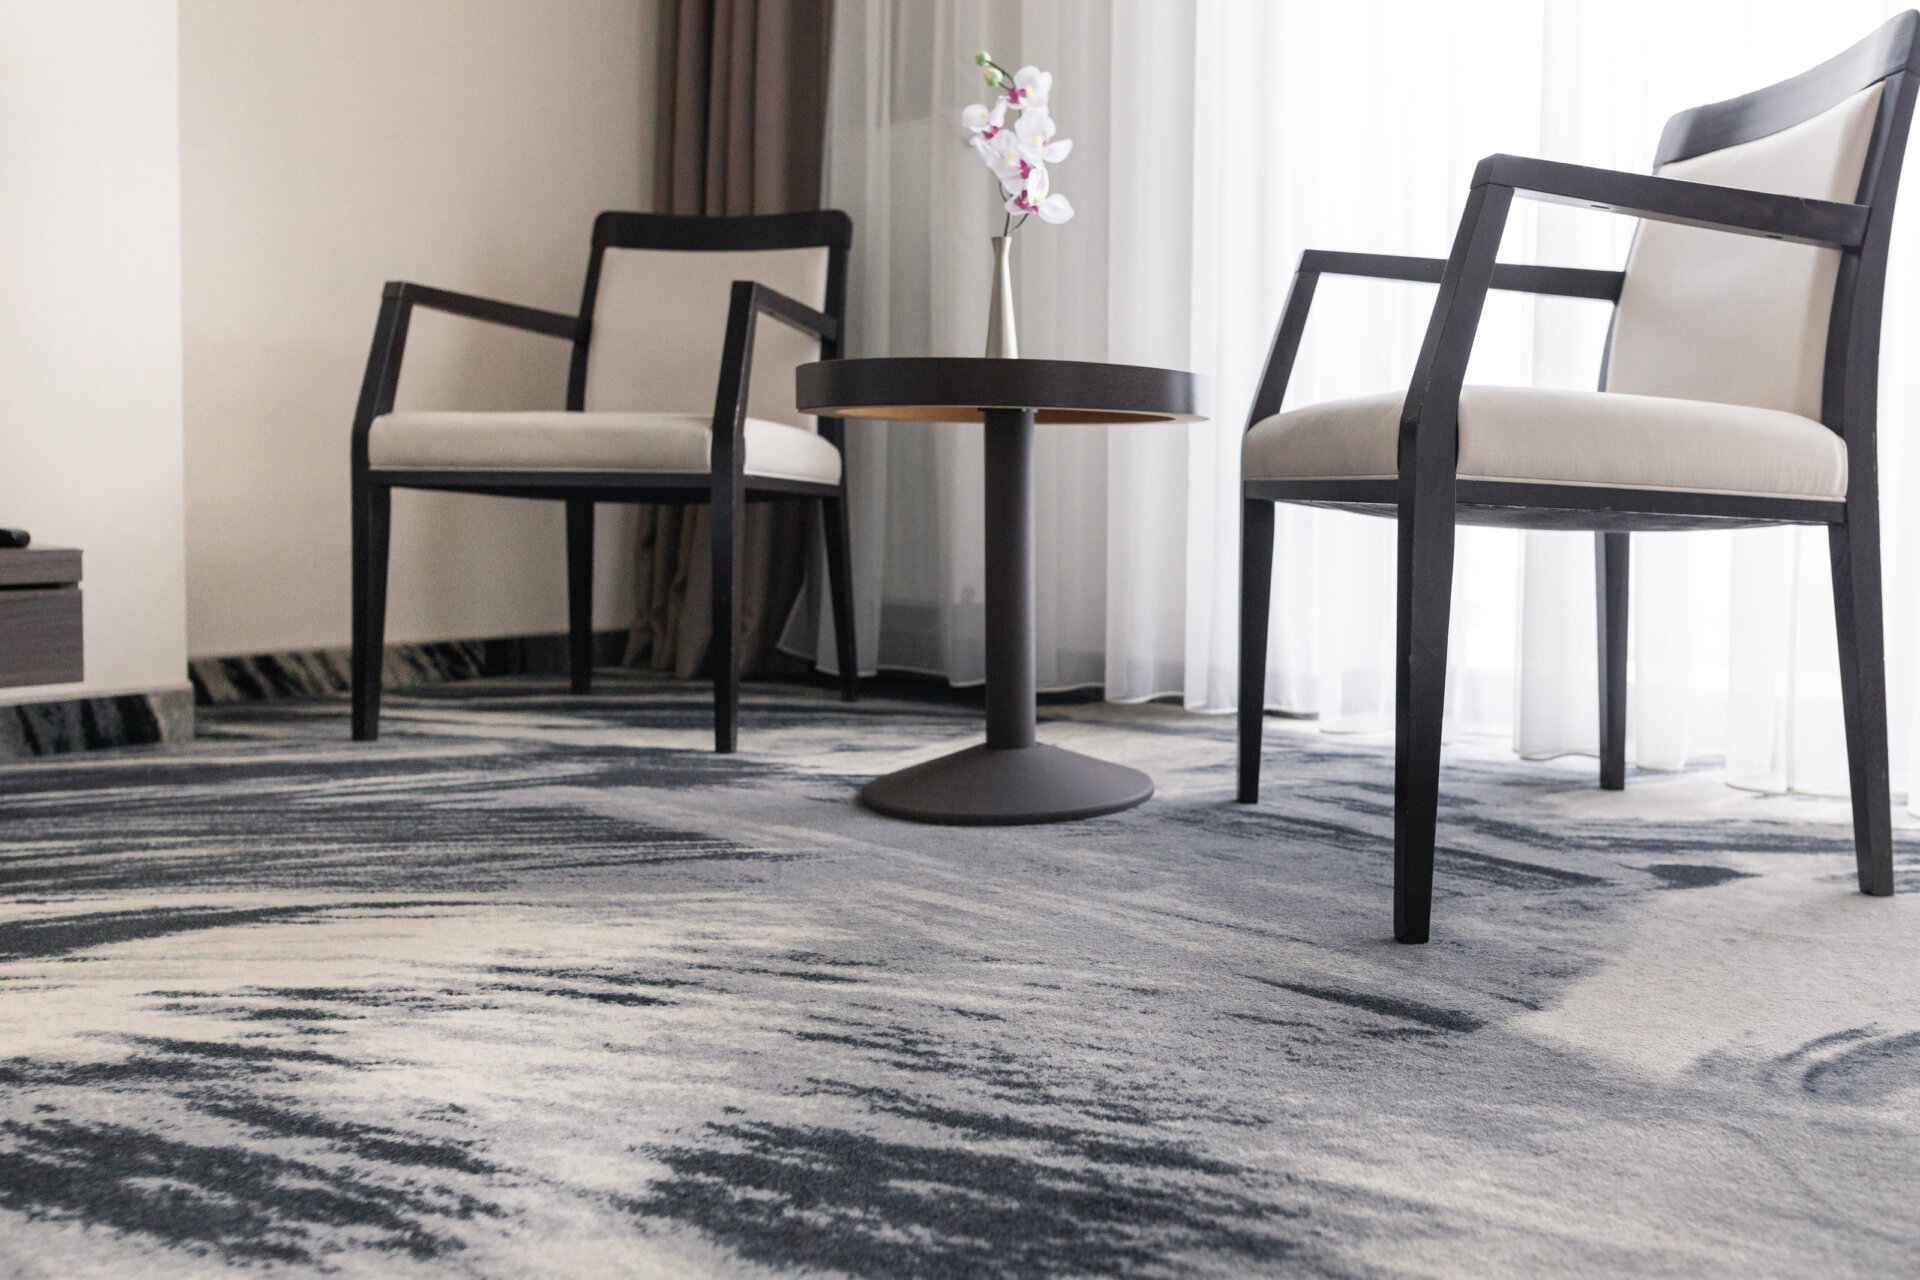 20210524-carpet&more-mamaia-hotel-scapino-by-hugmedia-004